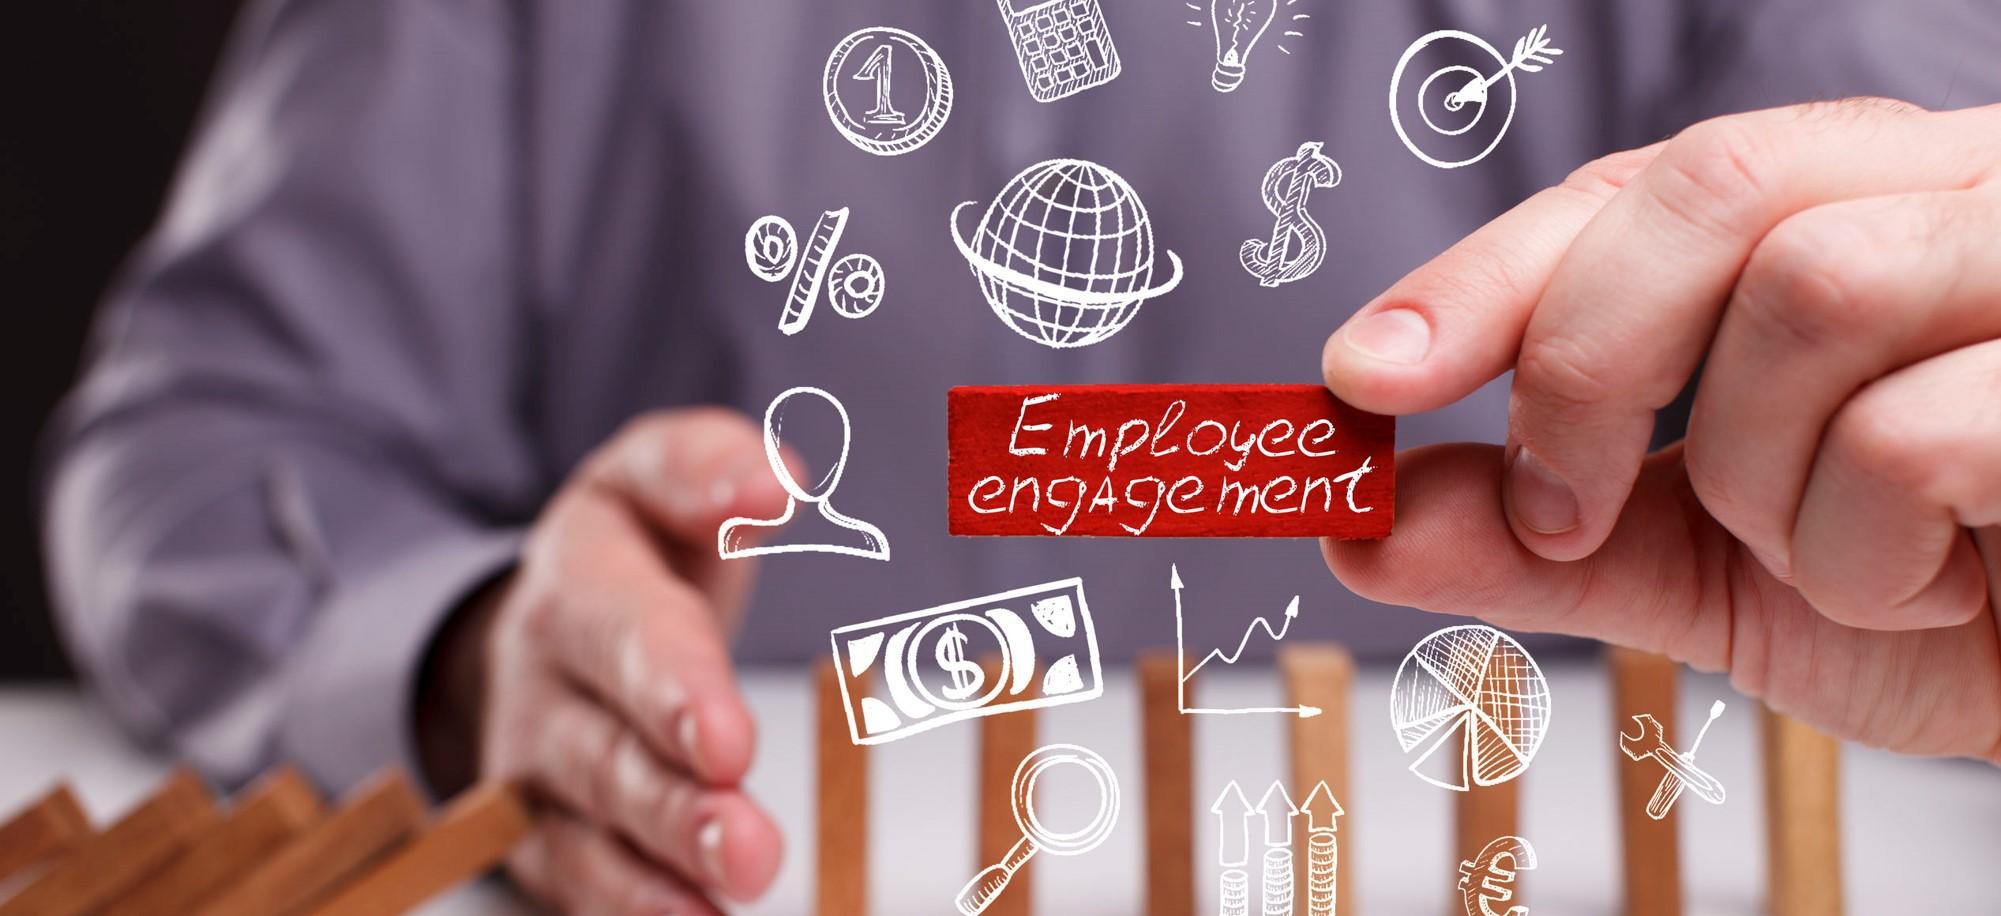 10 Knock-On Benefits of Employee Engagement